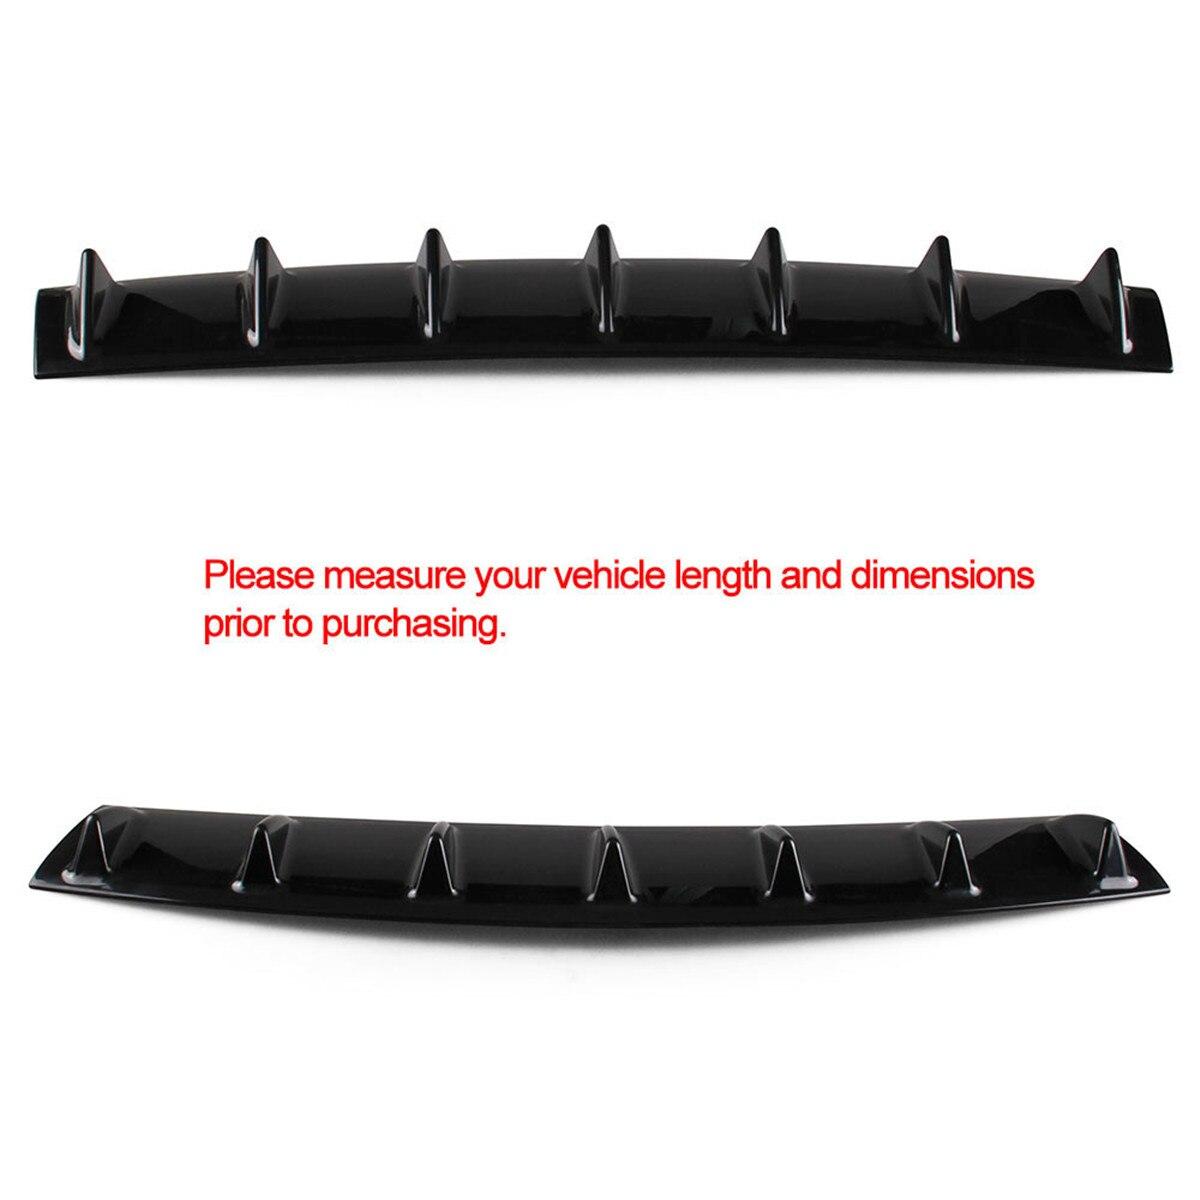 "23/""x6 Ikon style universal Rear hinten stoßstange lip diffusor 5 fin gloss black"